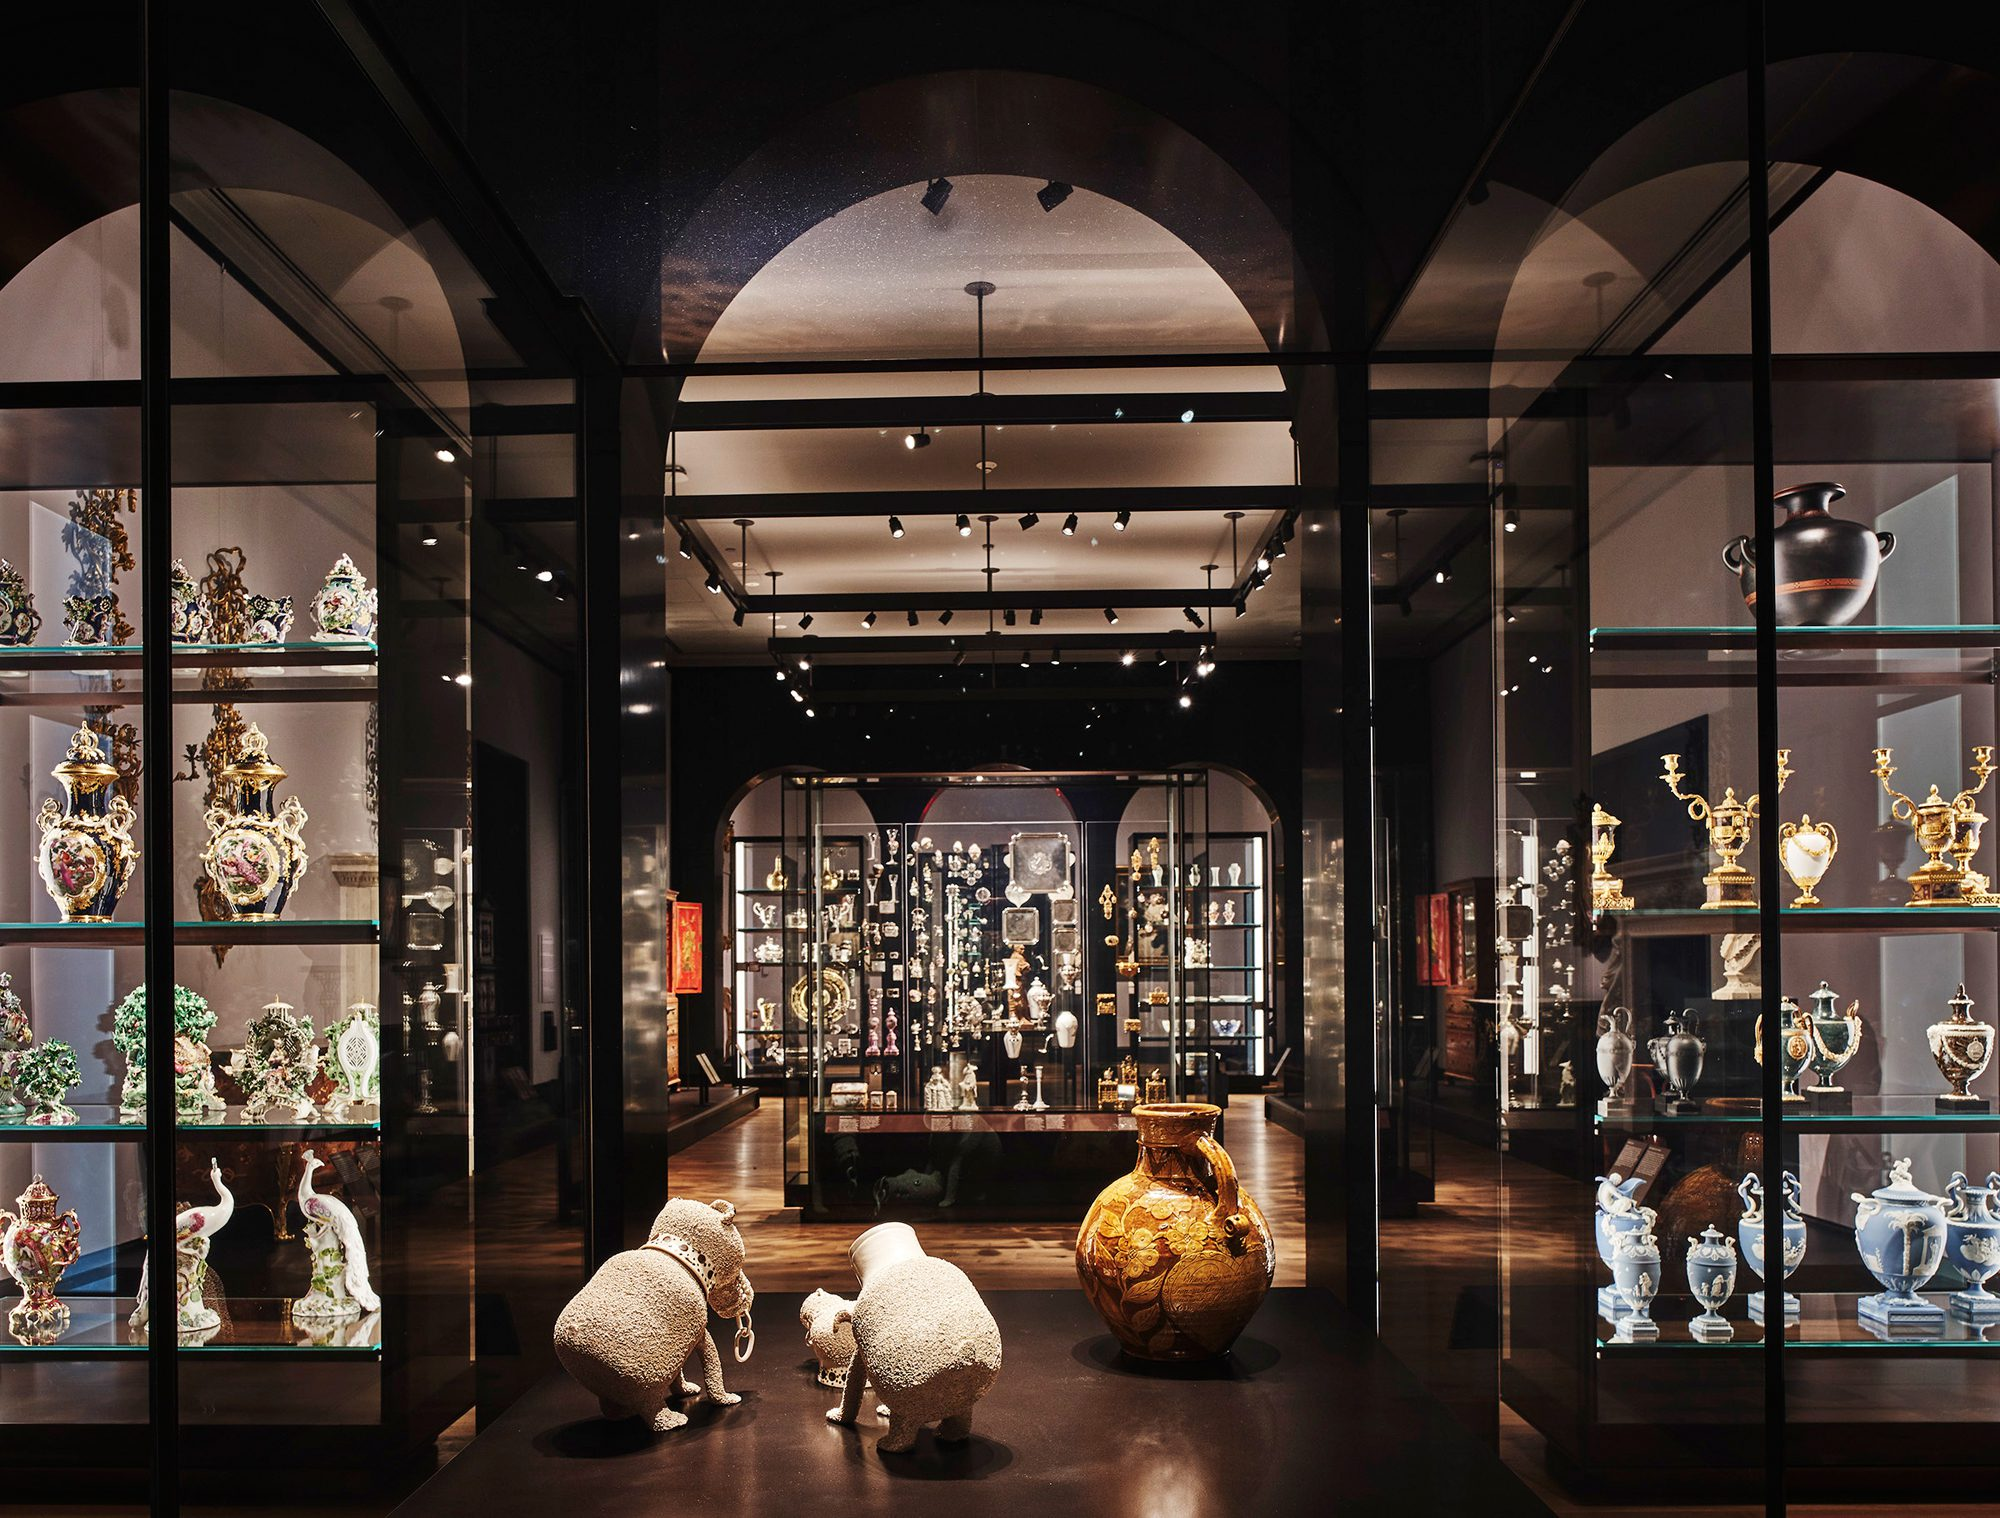 The Metropolitan Museum of Art British Galleries